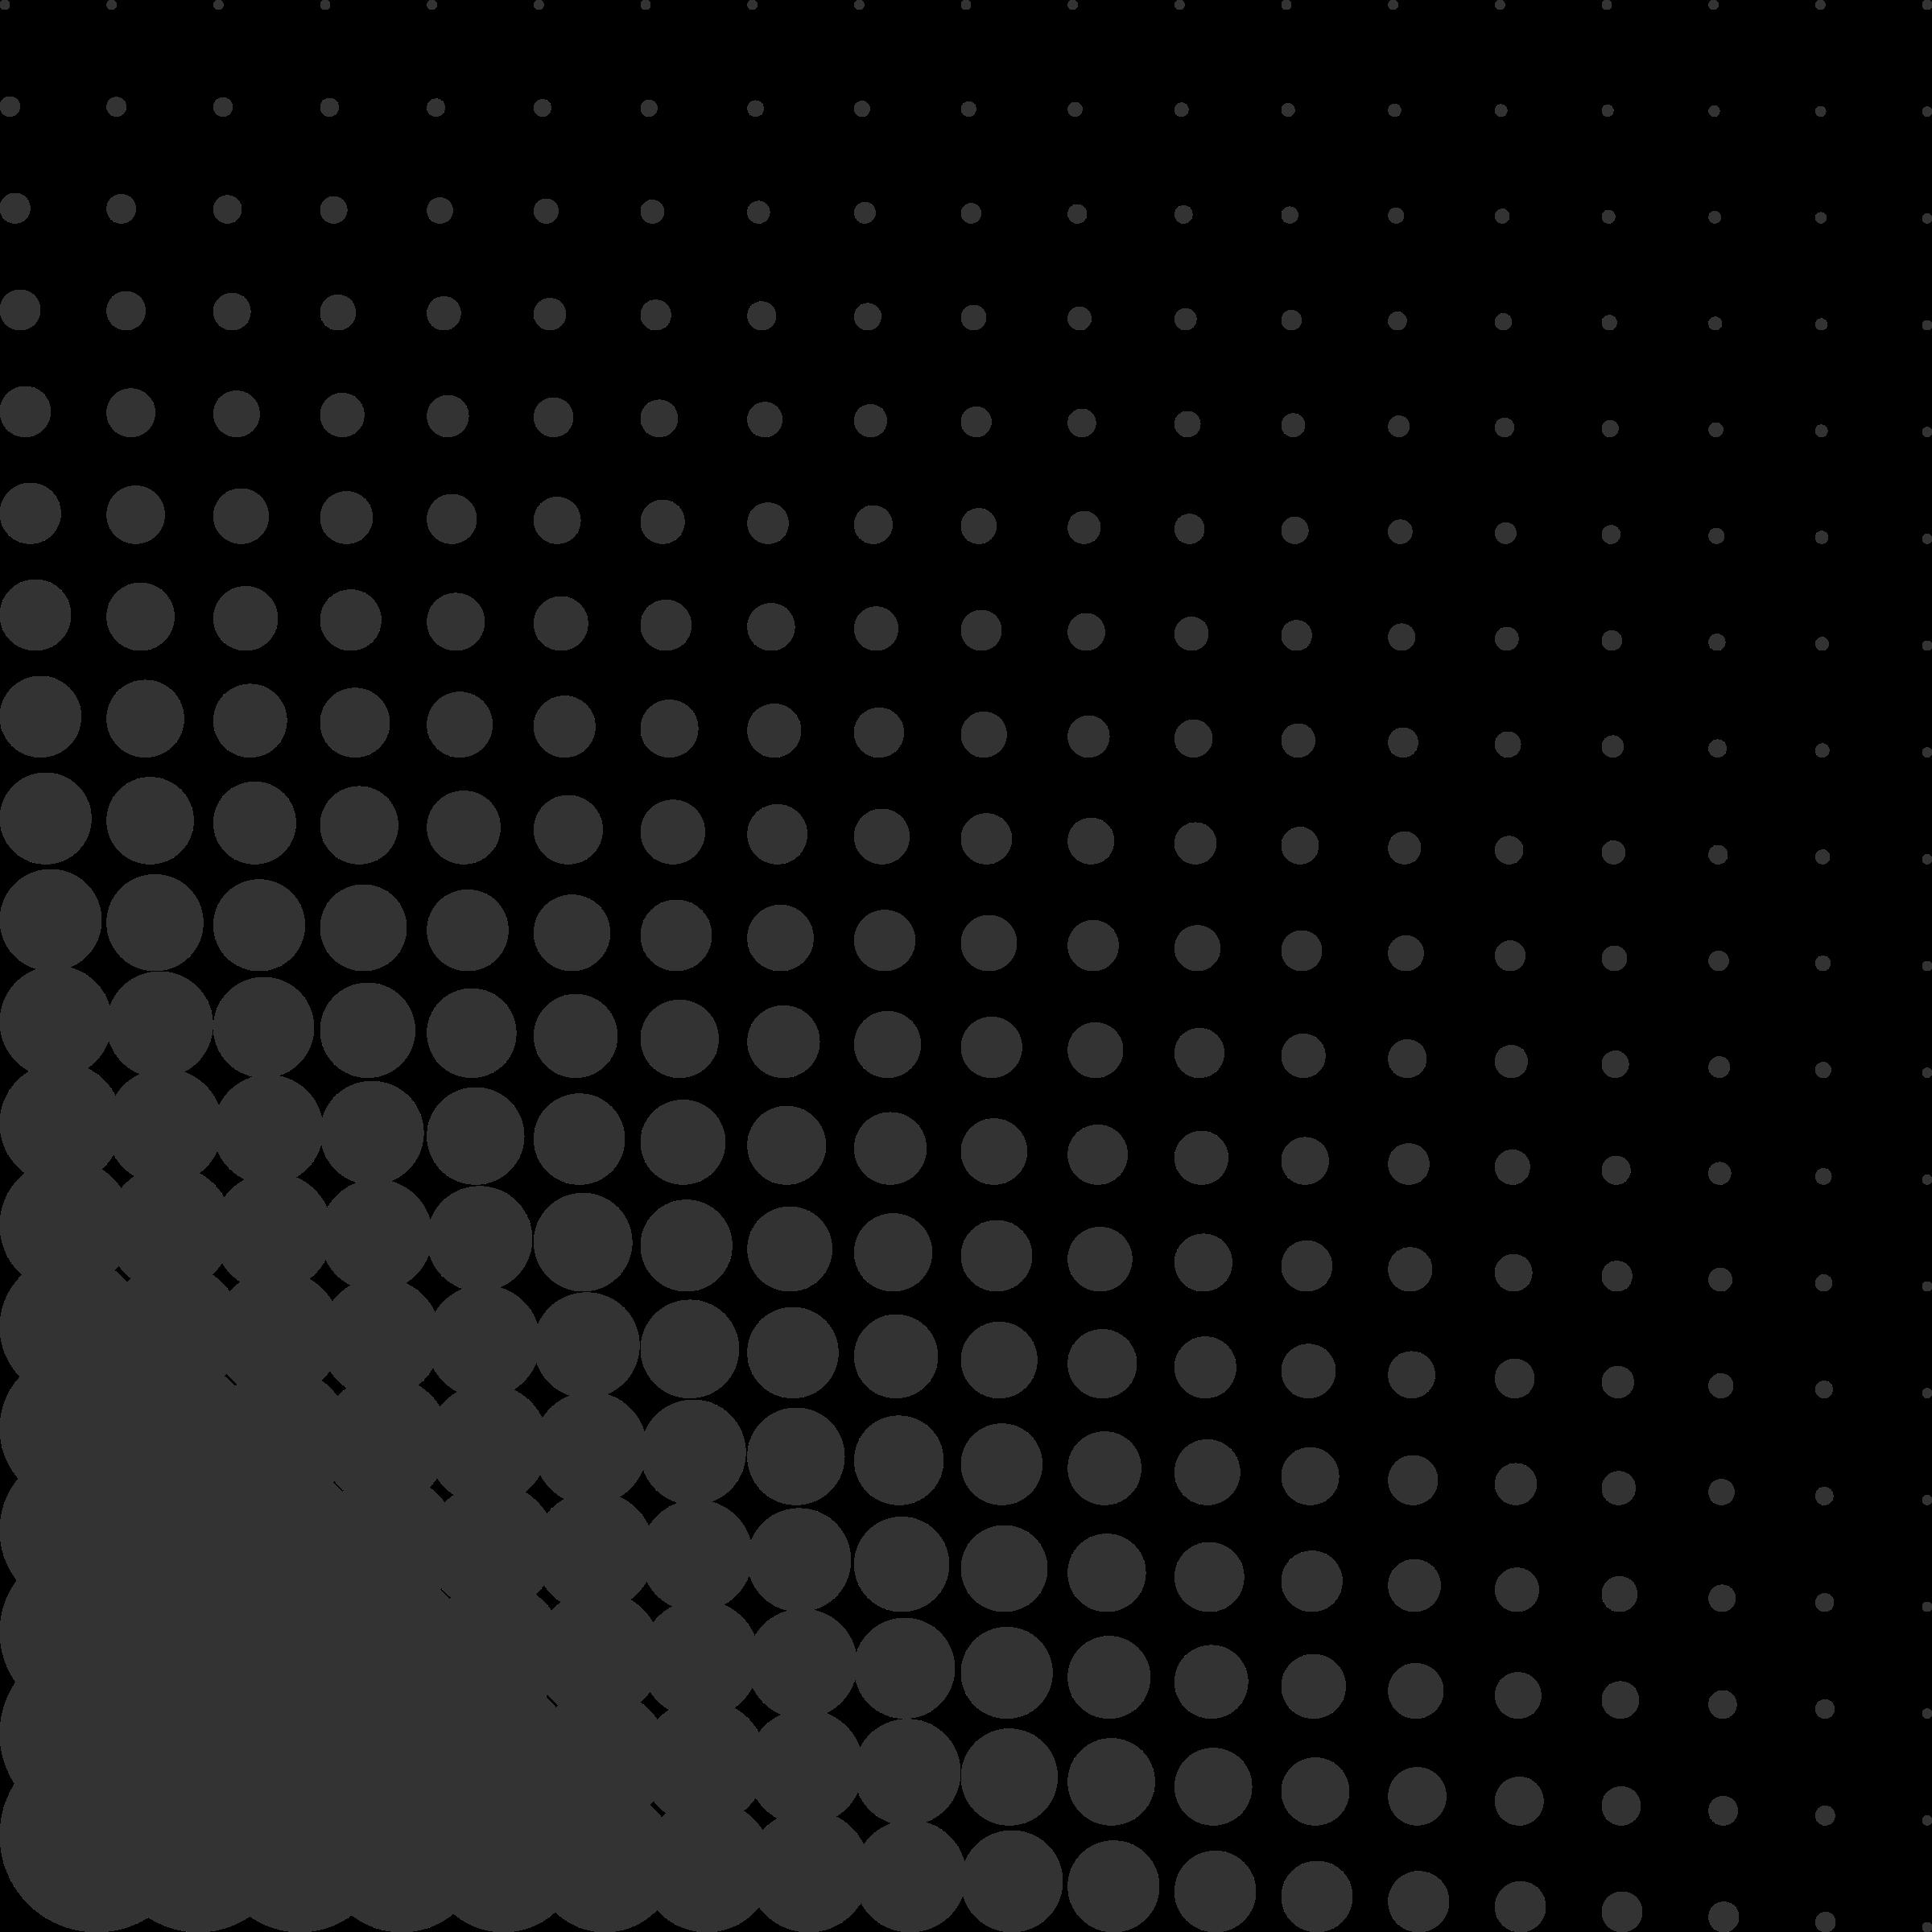 Comic dots big image. Dot clipart dot pattern